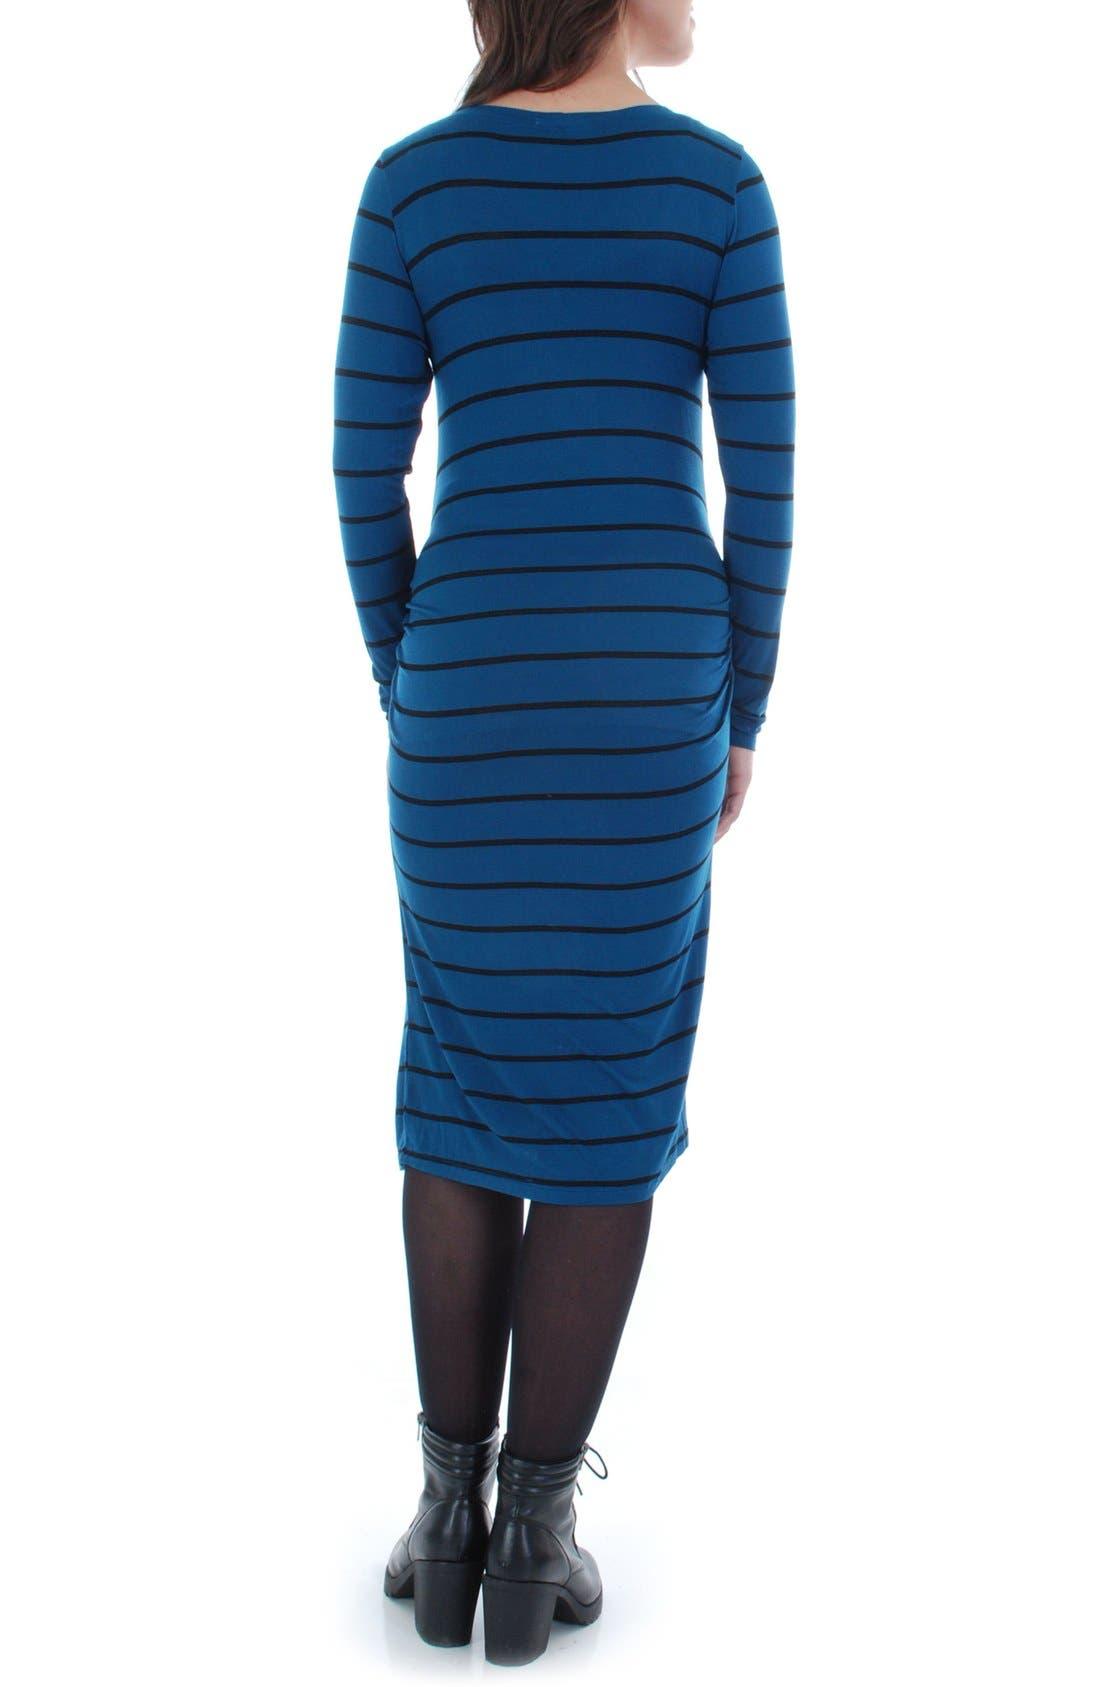 EverlyGrey 'Hanh' Maternity T-Shirt Dress,                             Alternate thumbnail 2, color,                             Teal Stripe